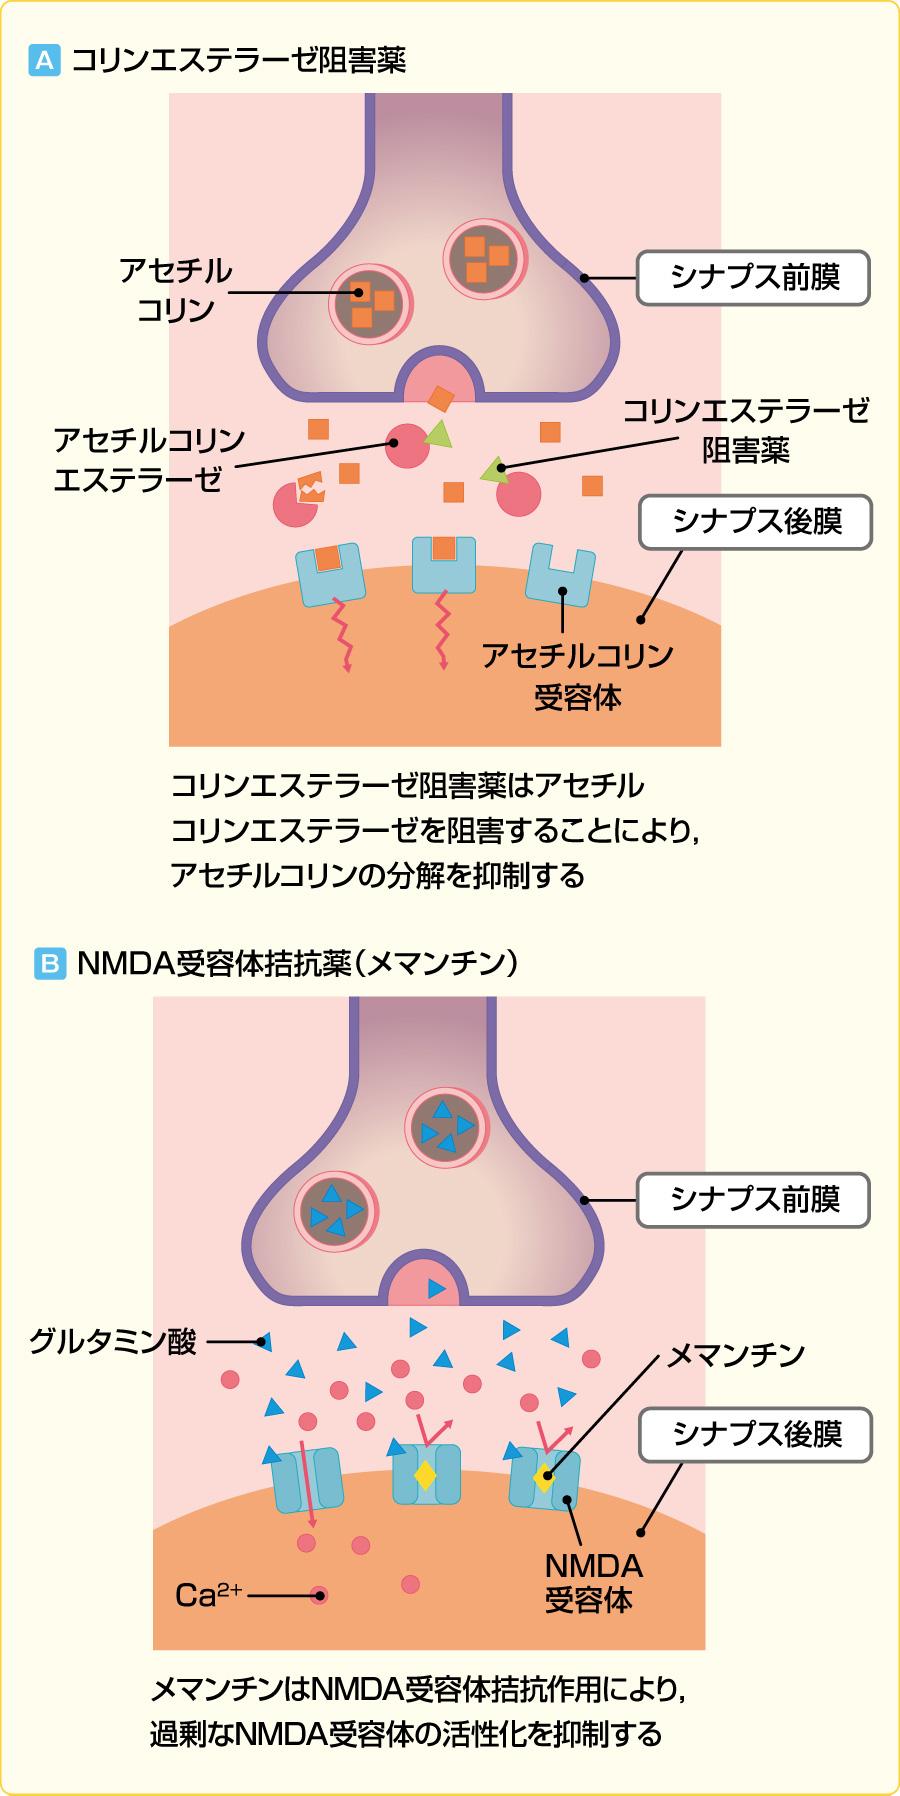 抗認知症薬の作用機序